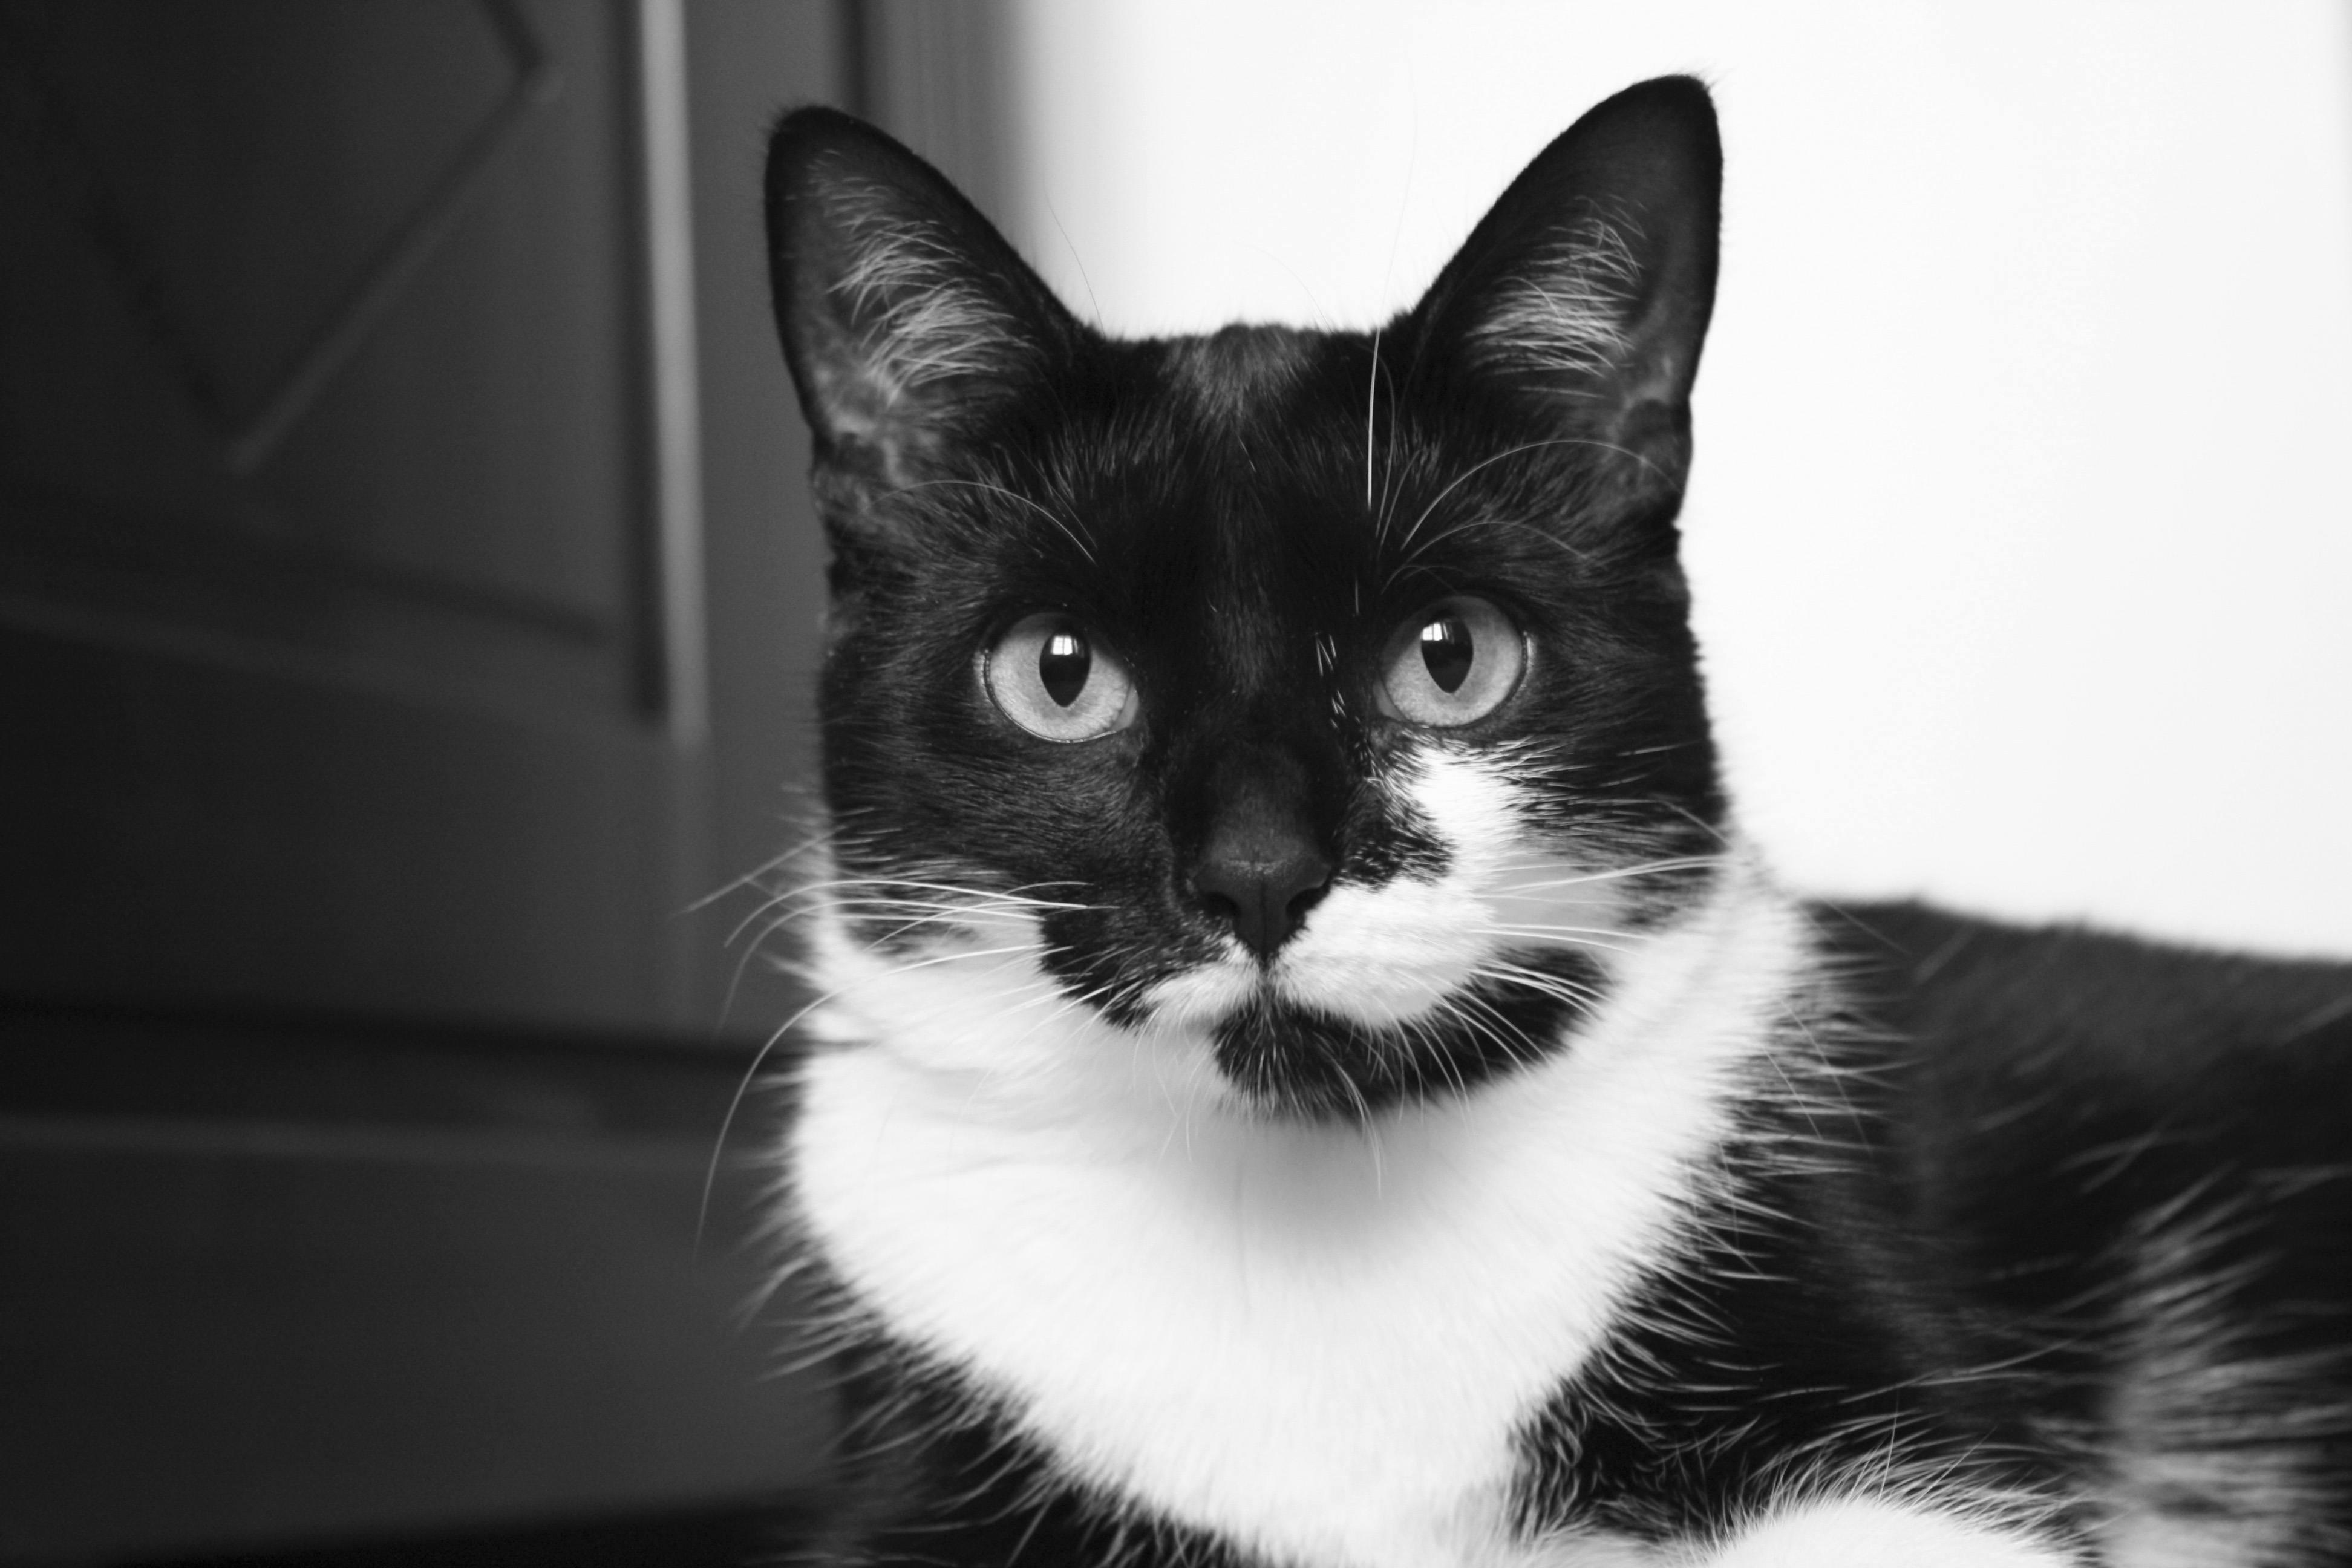 meine katzen amy und filou die katzen der katzenexpertin. Black Bedroom Furniture Sets. Home Design Ideas